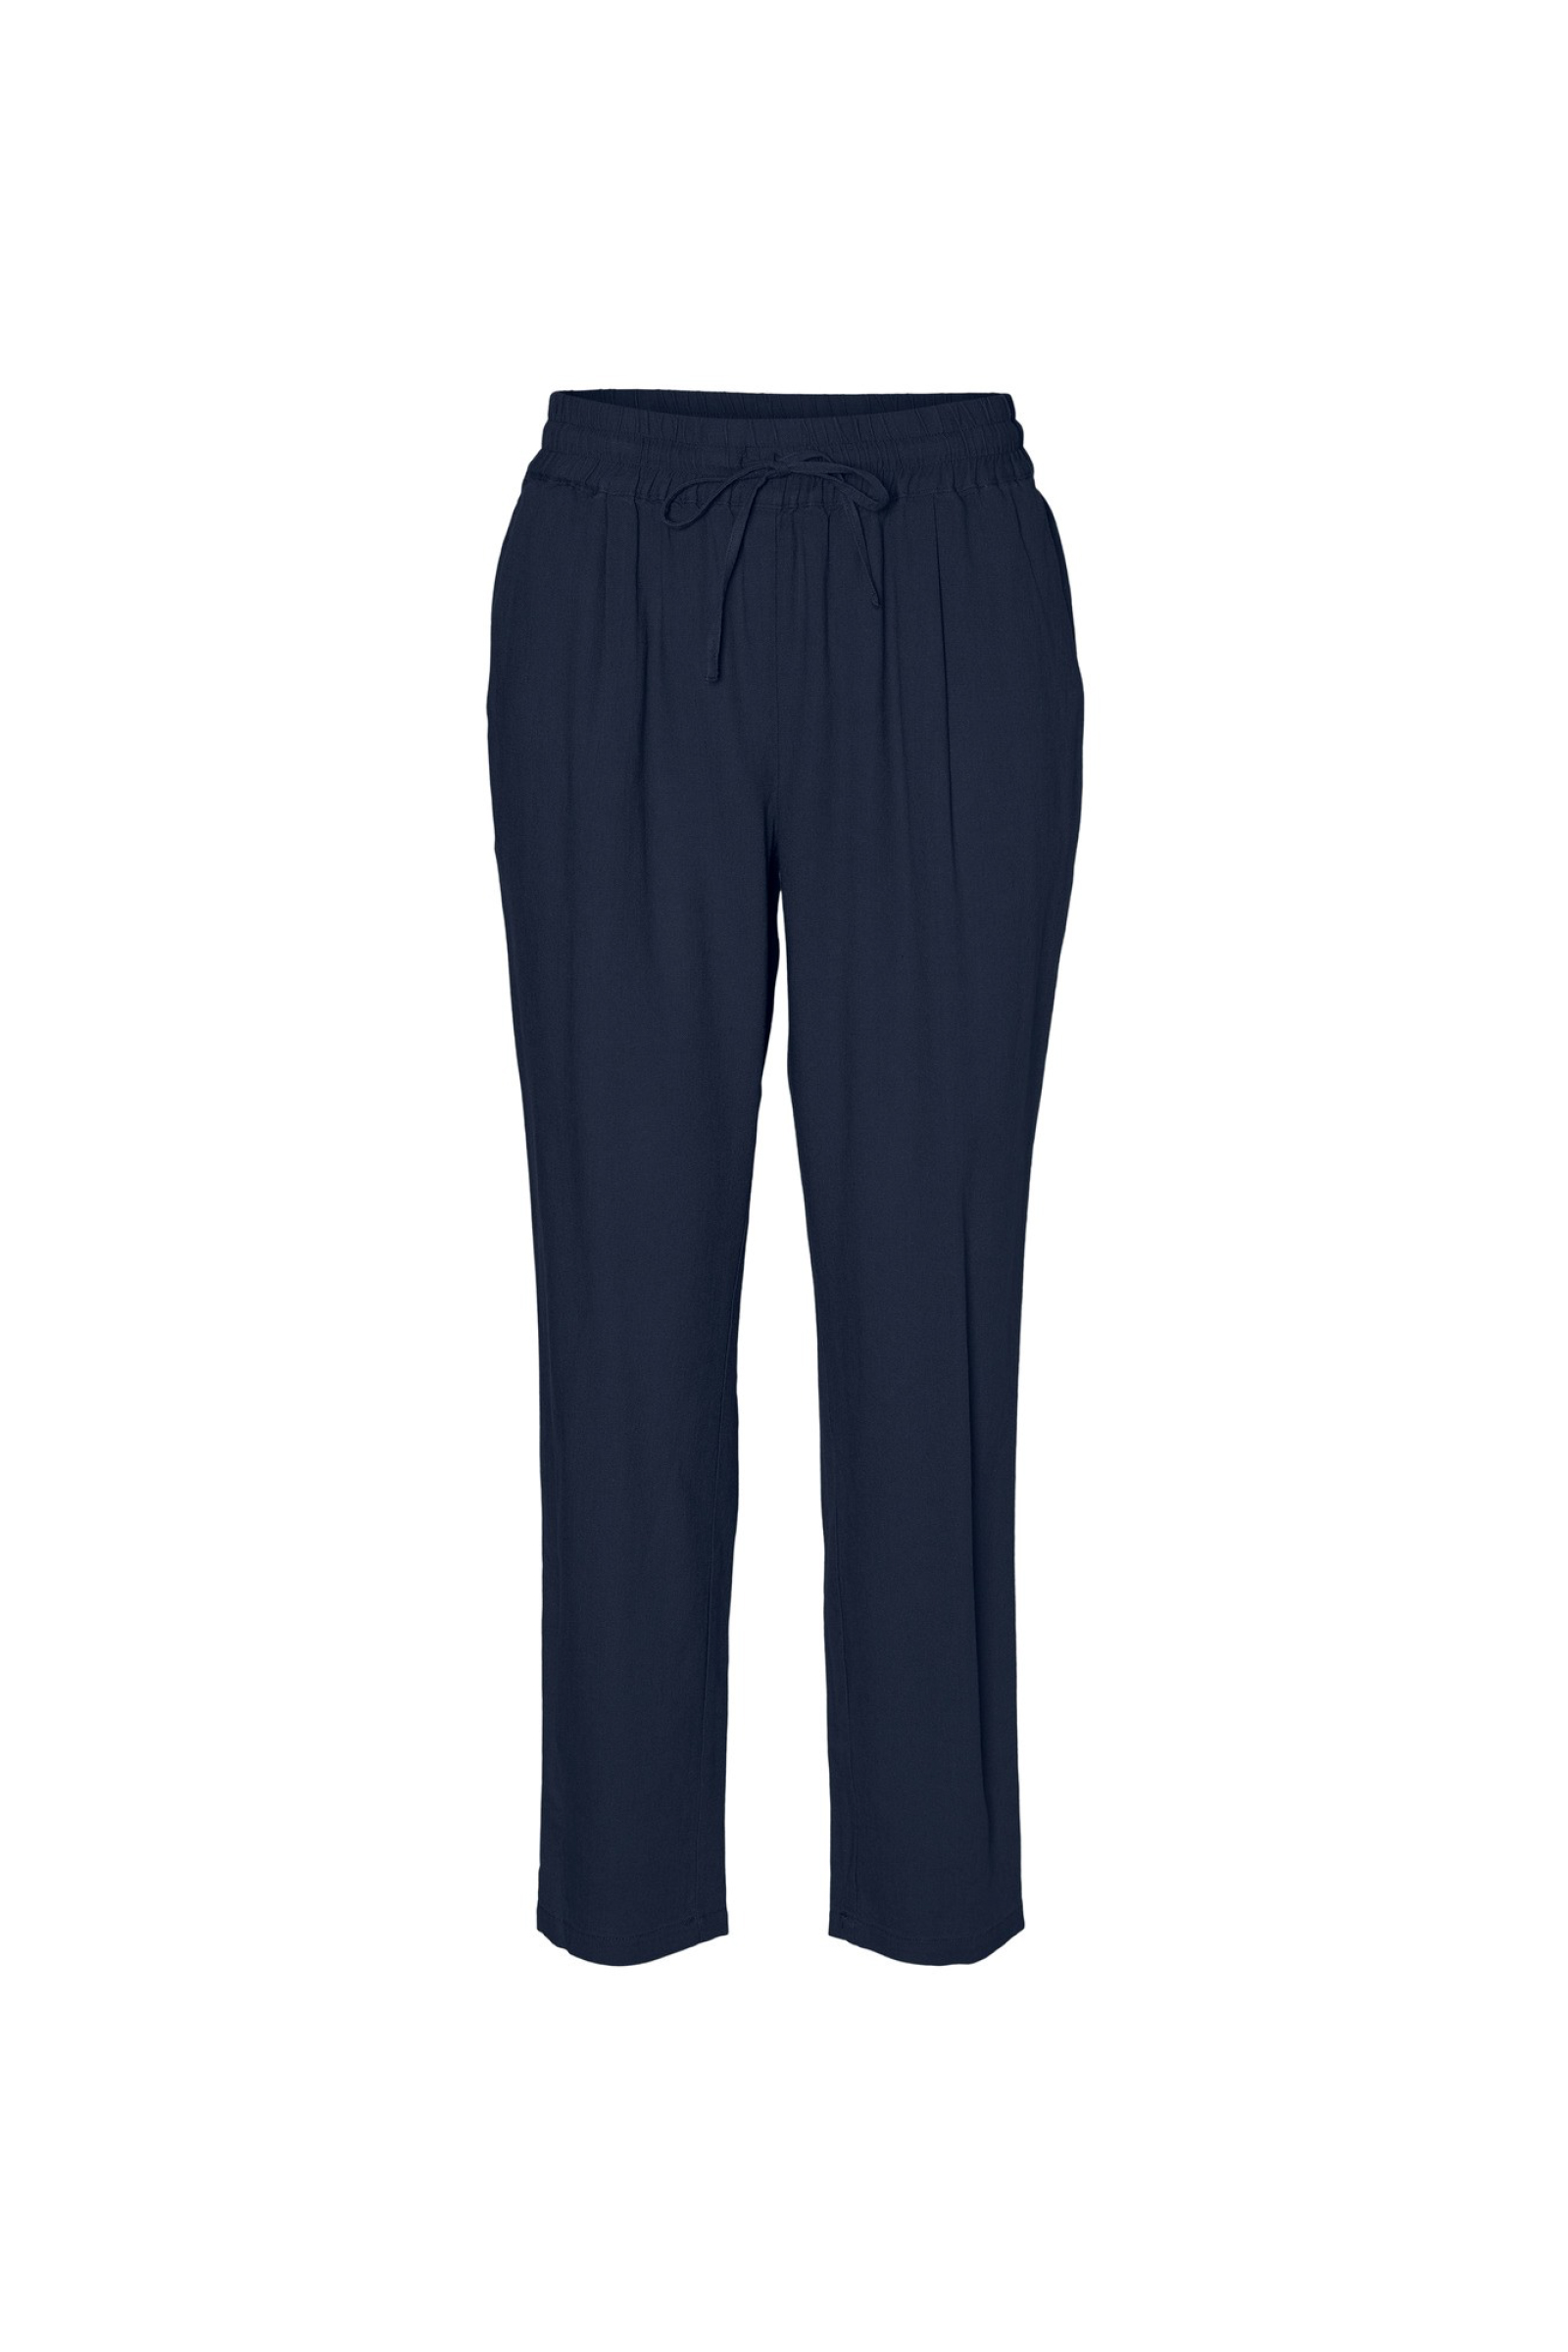 VERO MODA PANTALONE Donna Modello ASTIMILO VERO MODA | Pantalone | 10244009Navy Blazer